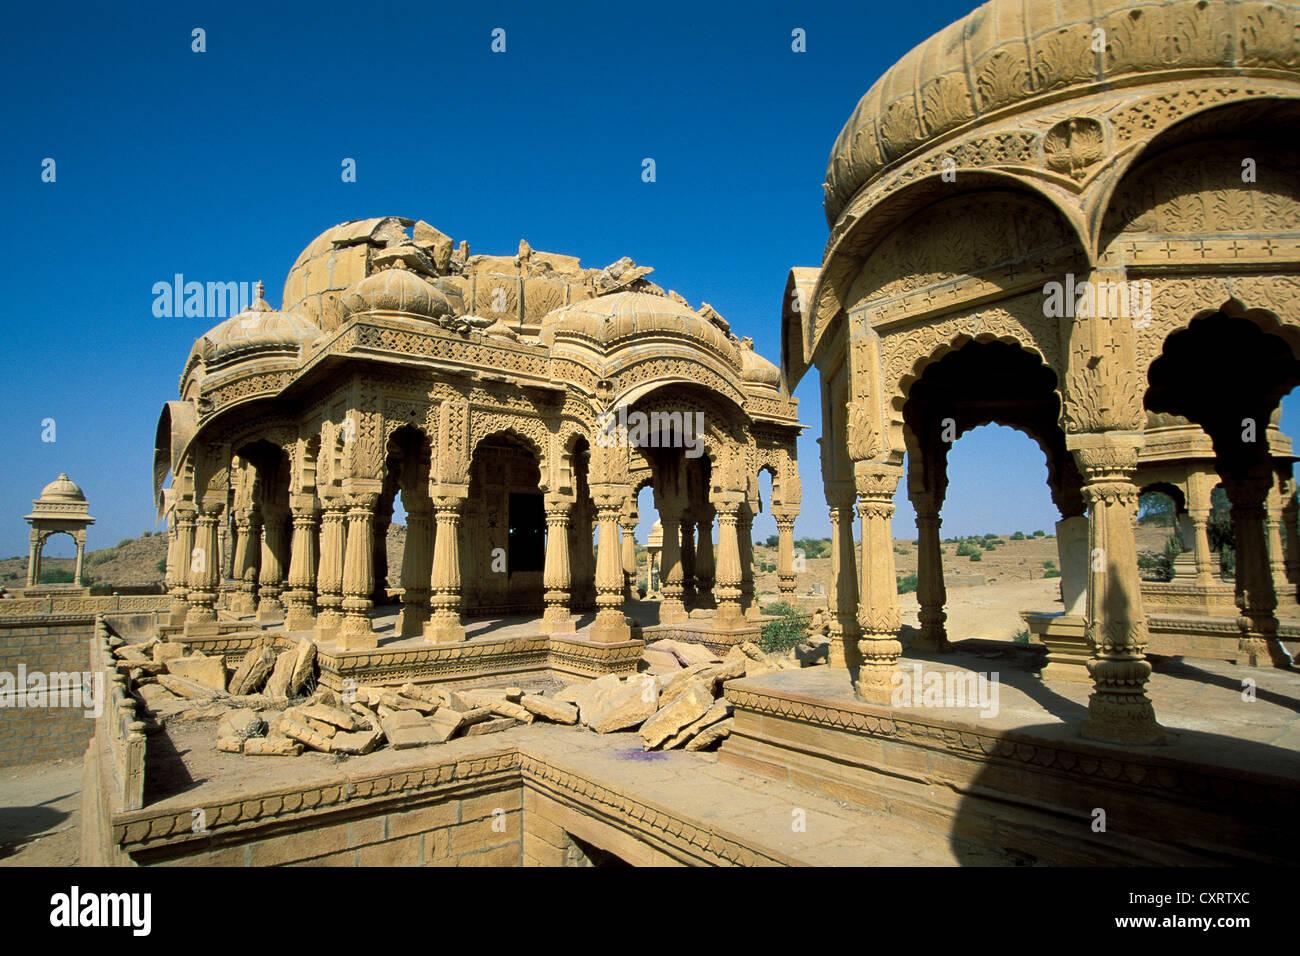 Cenotaphs, tombs of the rulers of Jaisalmer, Jaisalmer, Rajasthan, India, Asia - Stock Image